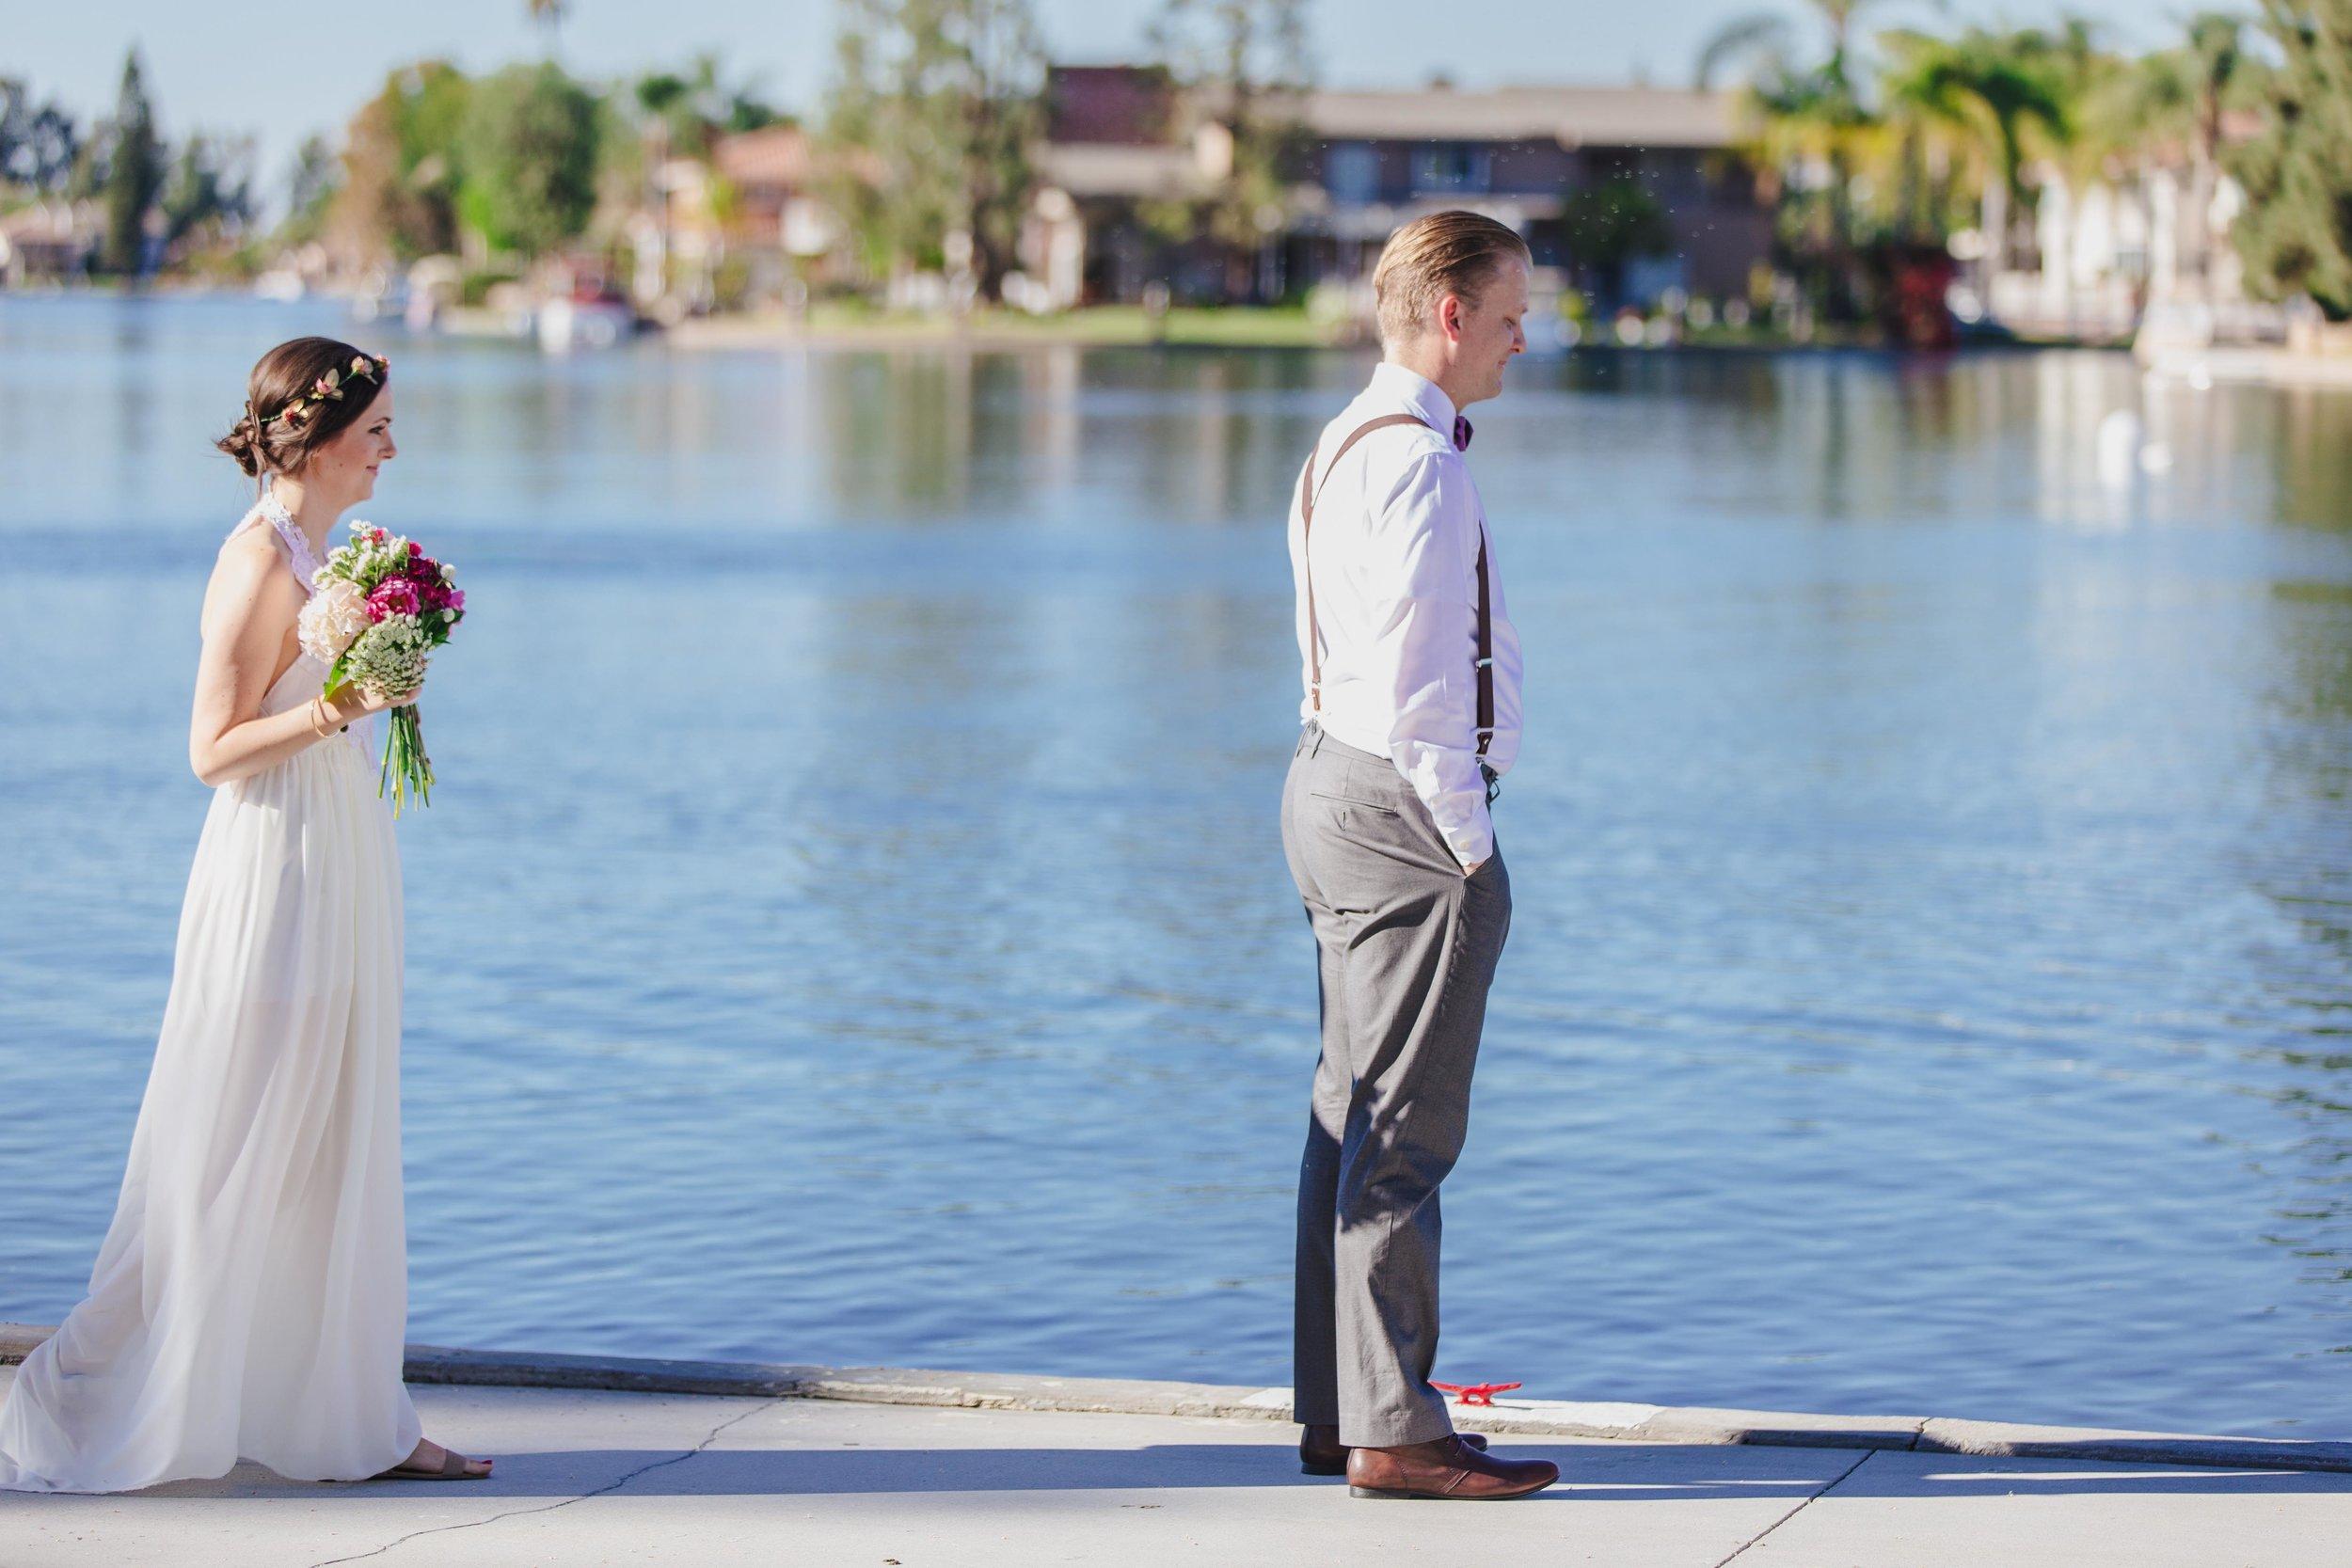 20141024-DePartee-Wedding-APavone-023-sm.jpg